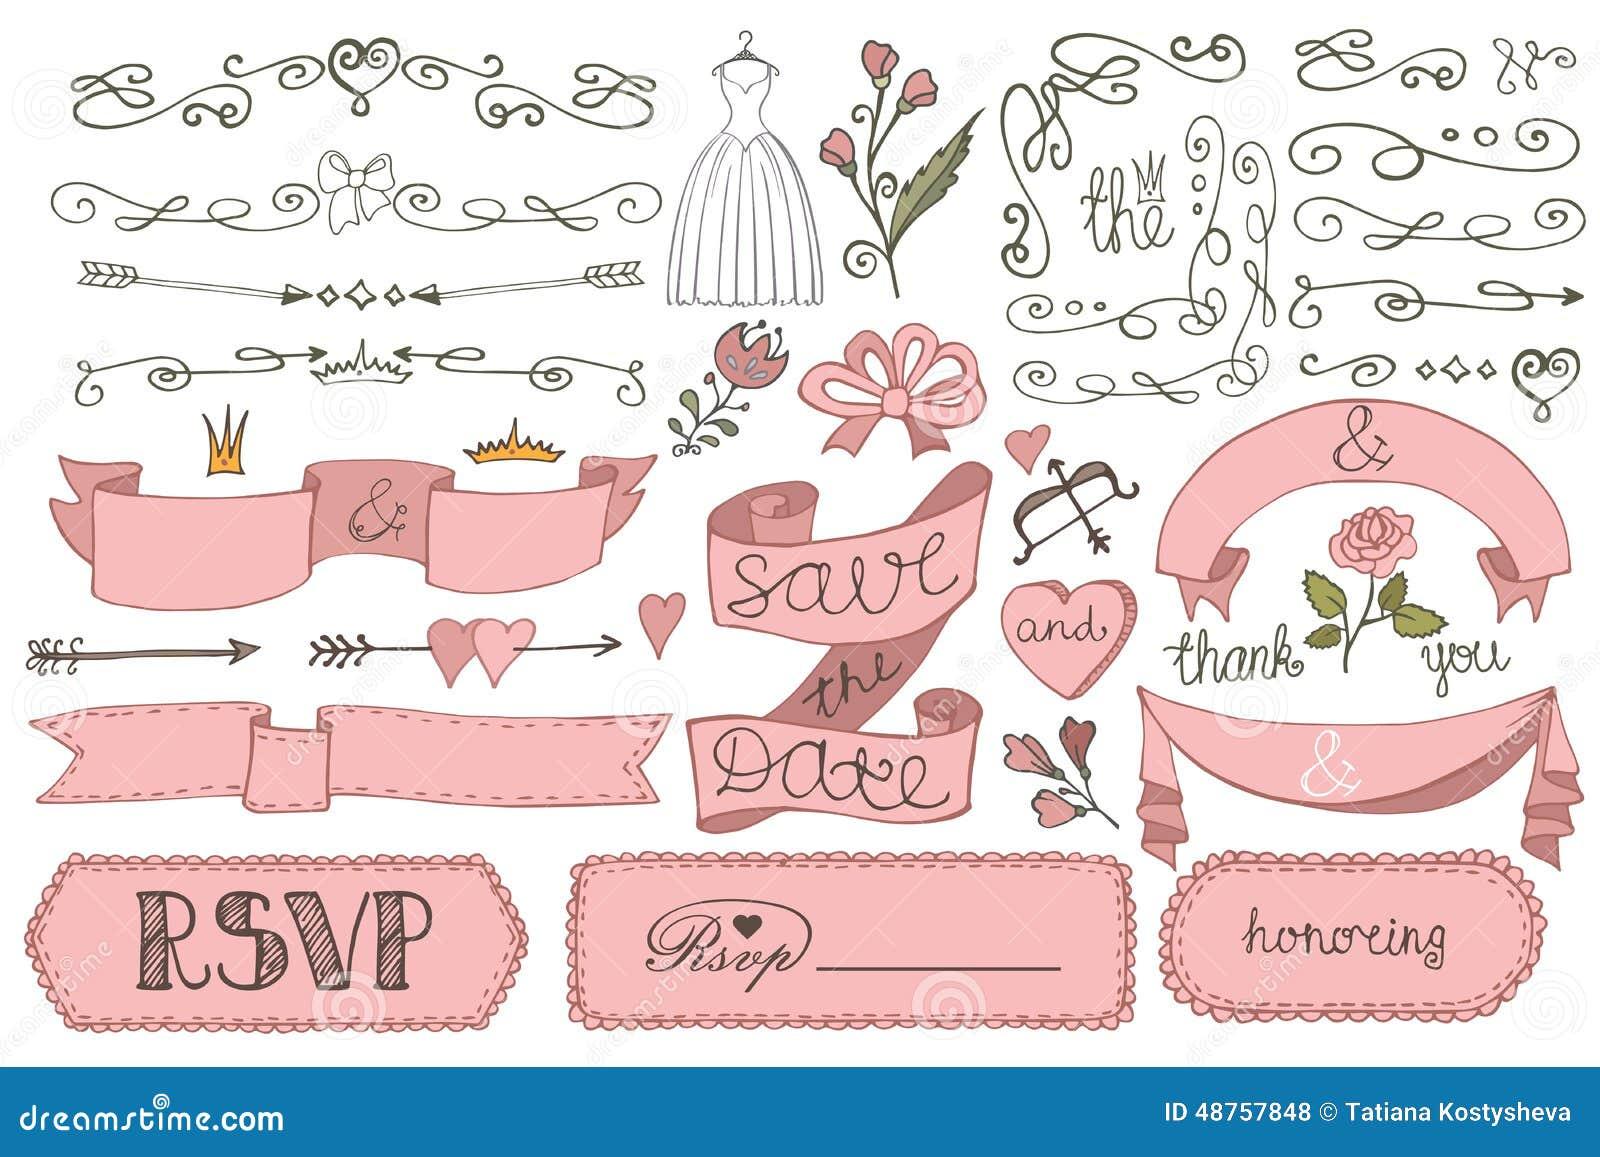 Ribbon Wedding Invitation with perfect invitation sample